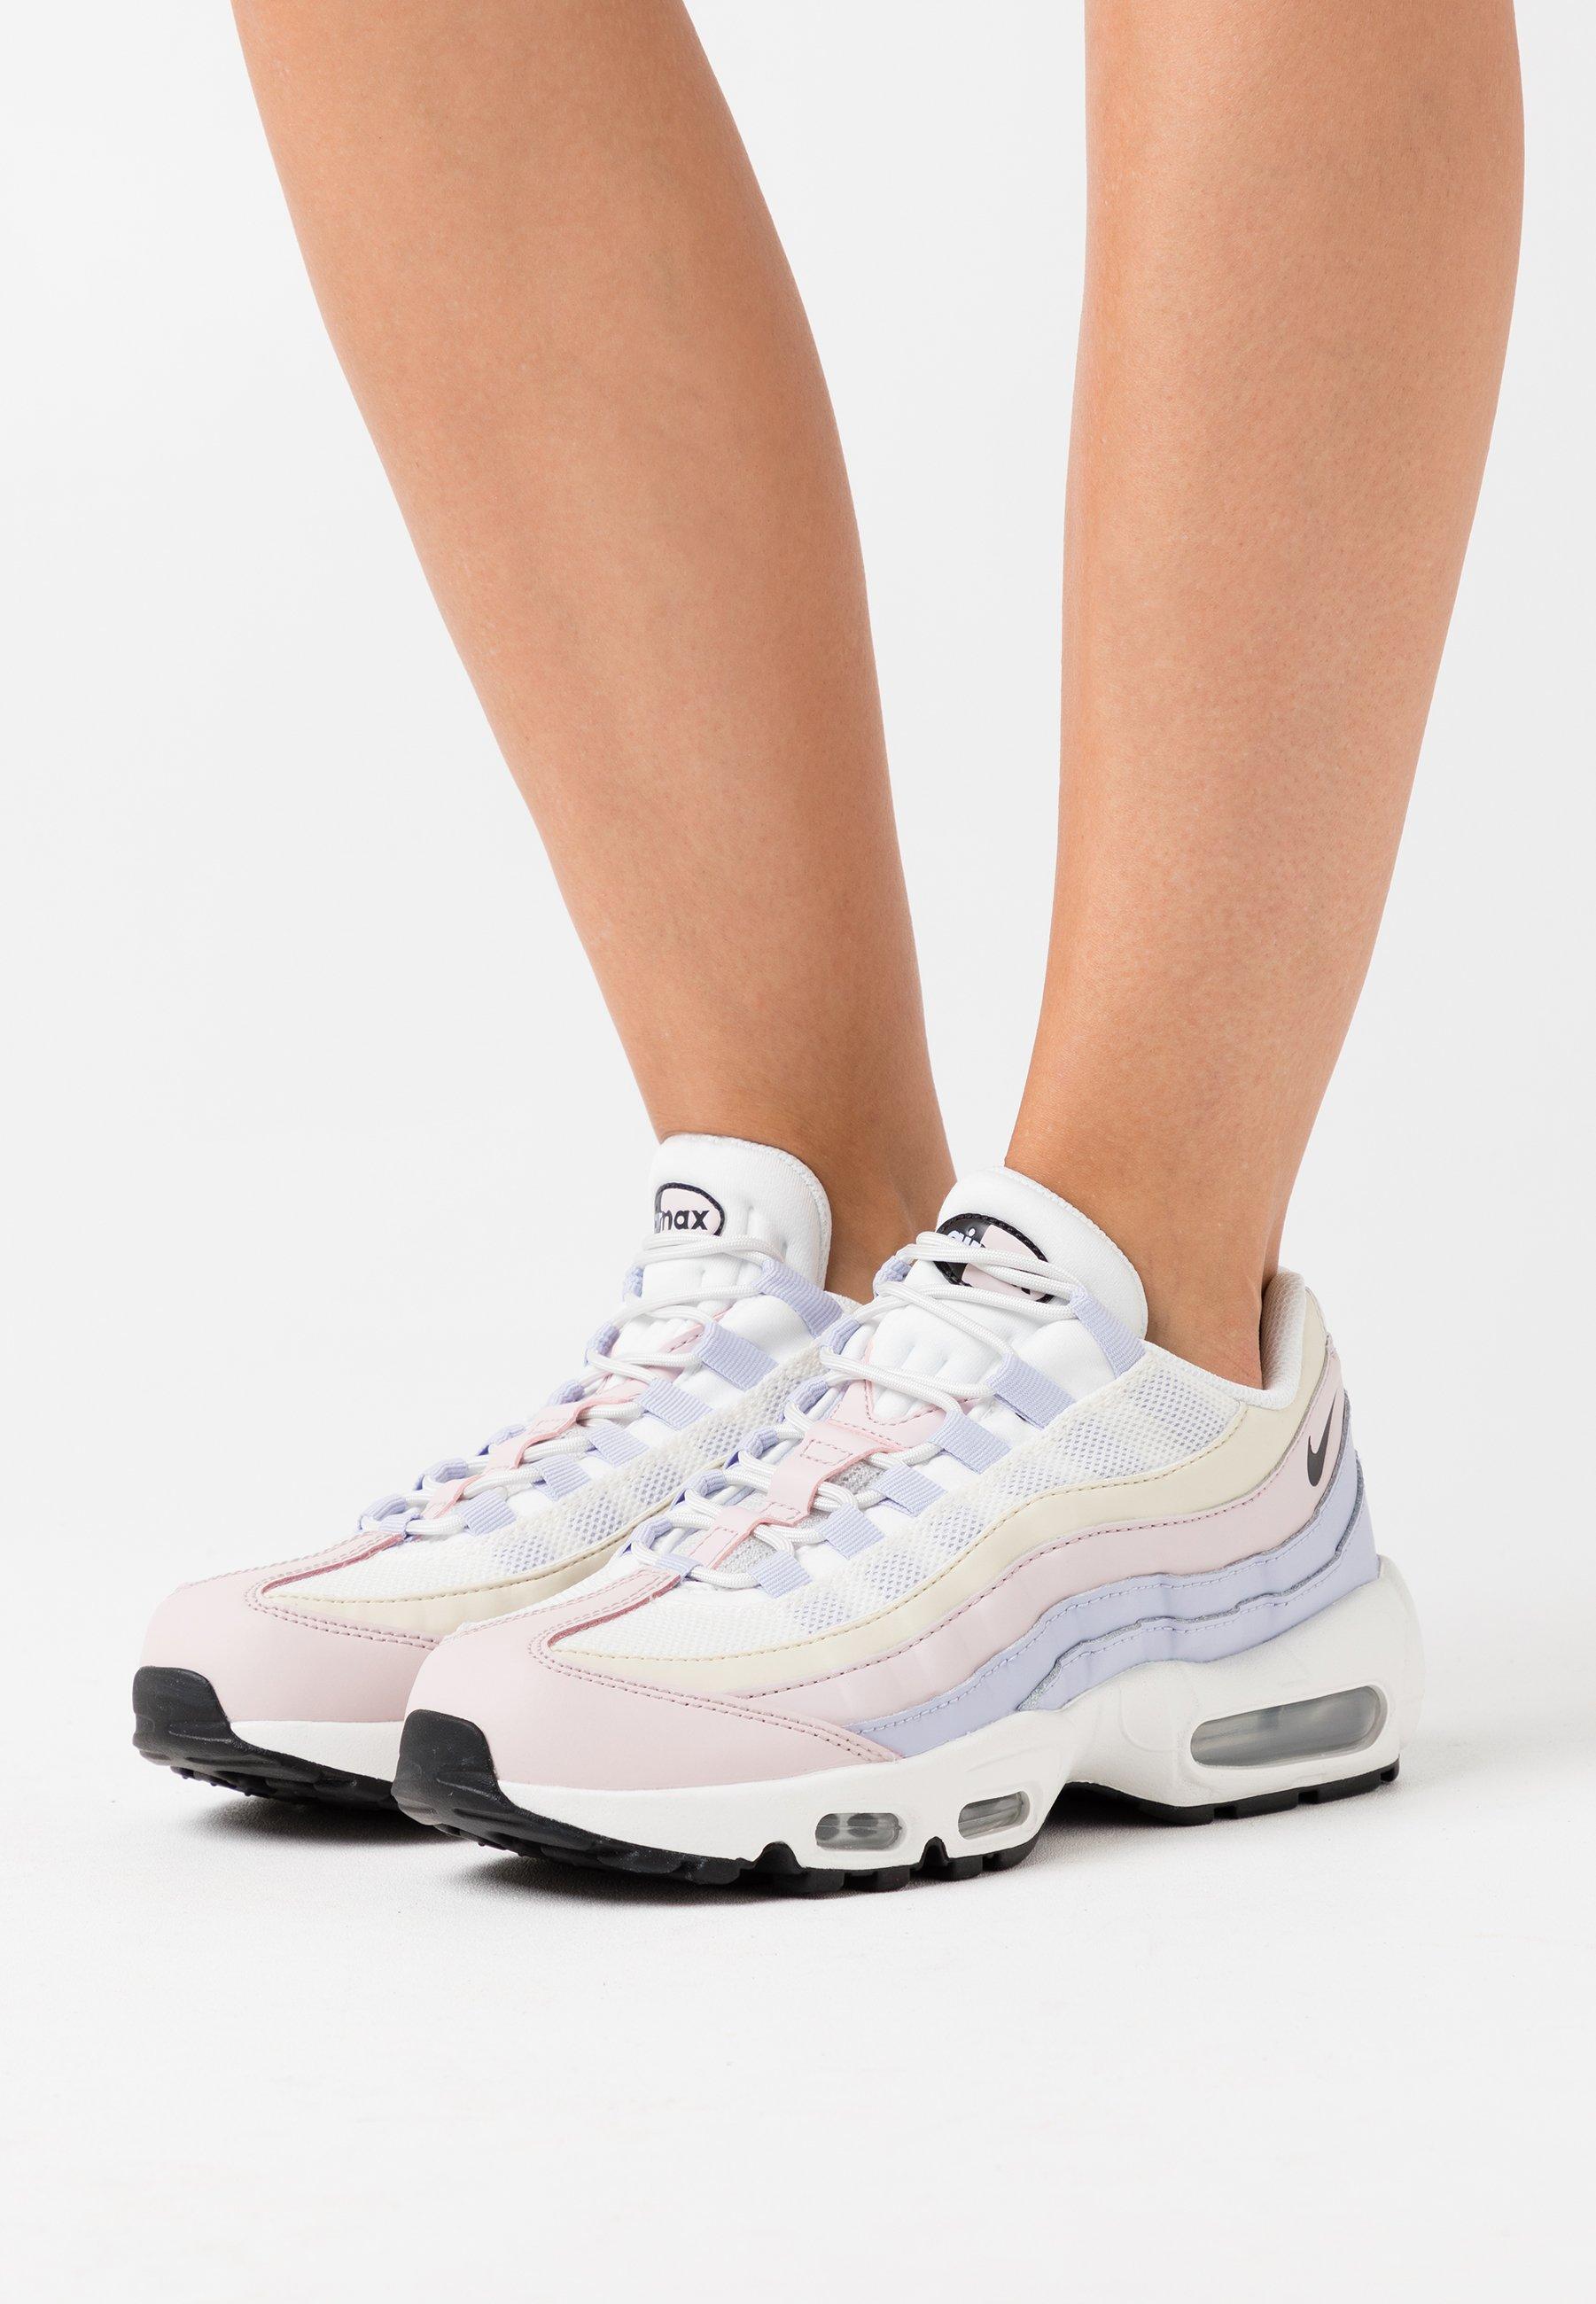 Expectativa Increíble Adición  Nike Sportswear AIR MAX 95 - Trainers - ghost/black/summit white/barely  rose/glacier blue/grey - Zalando.co.uk